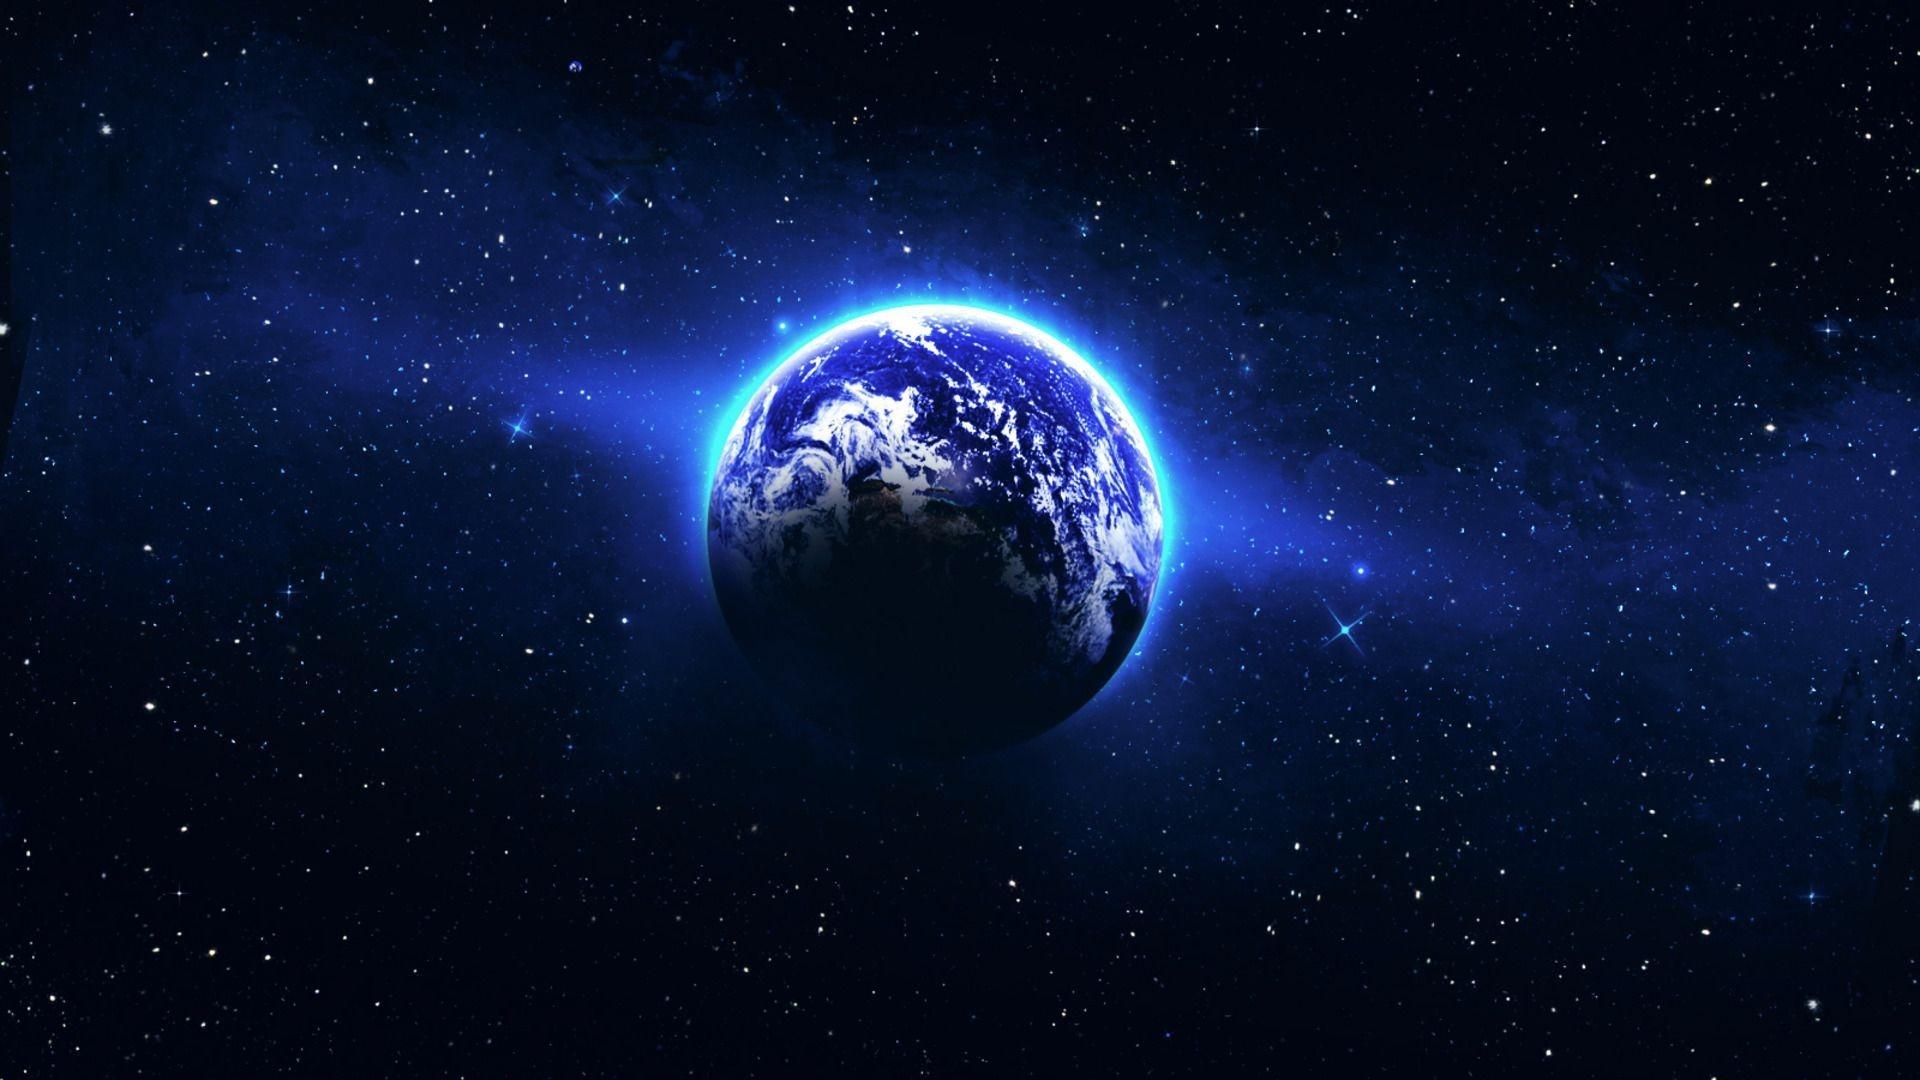 Earth HD Wallpaper - backiee